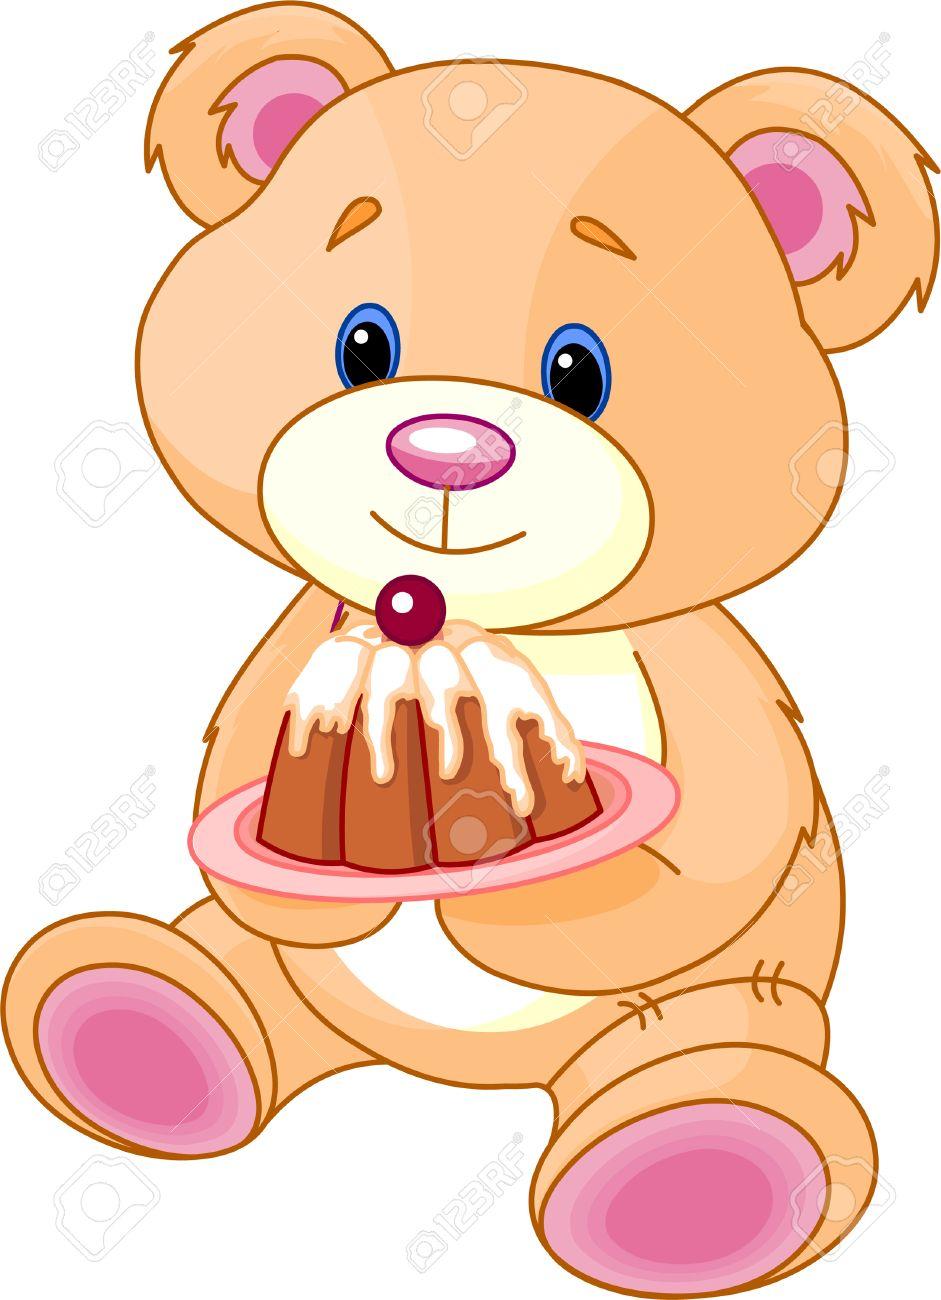 Cute Teddy Bear With Birthday Cake Illustration Stock Vector